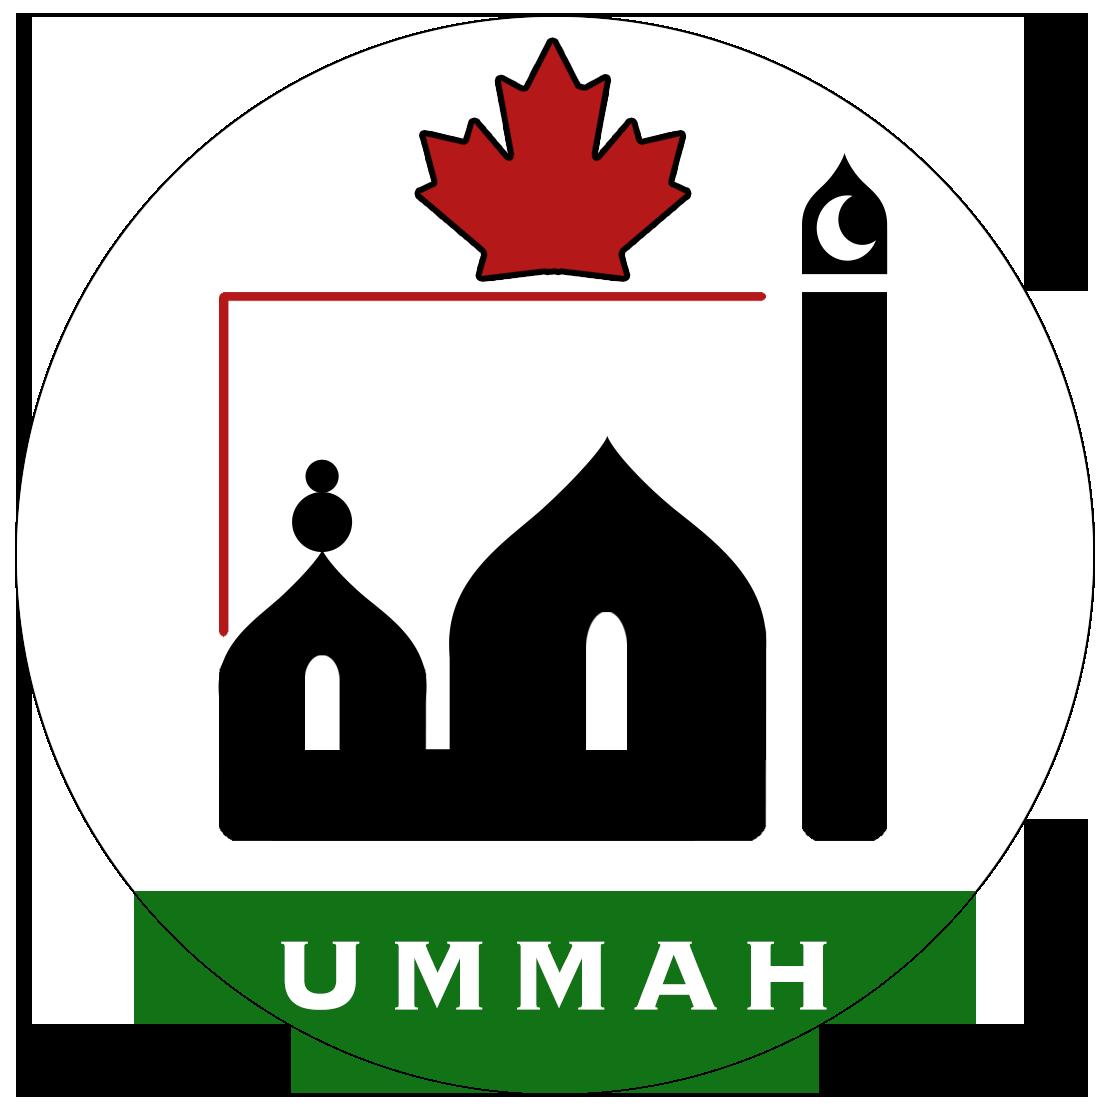 ummah new logo